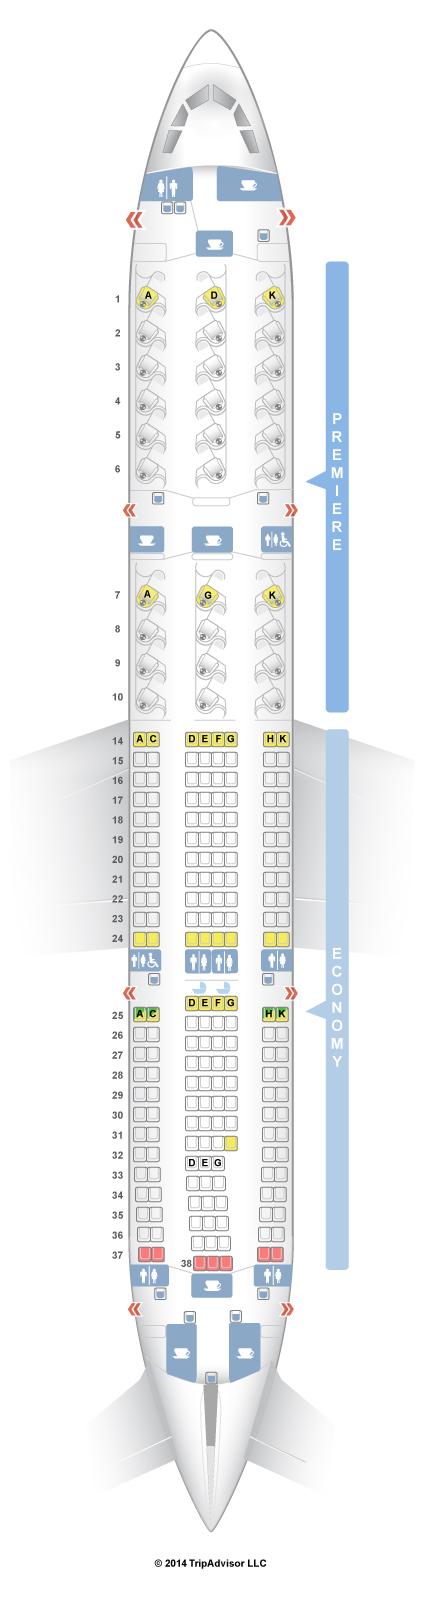 Seatguru Seat Map Jet Airways Airbus A330 200 332 V1